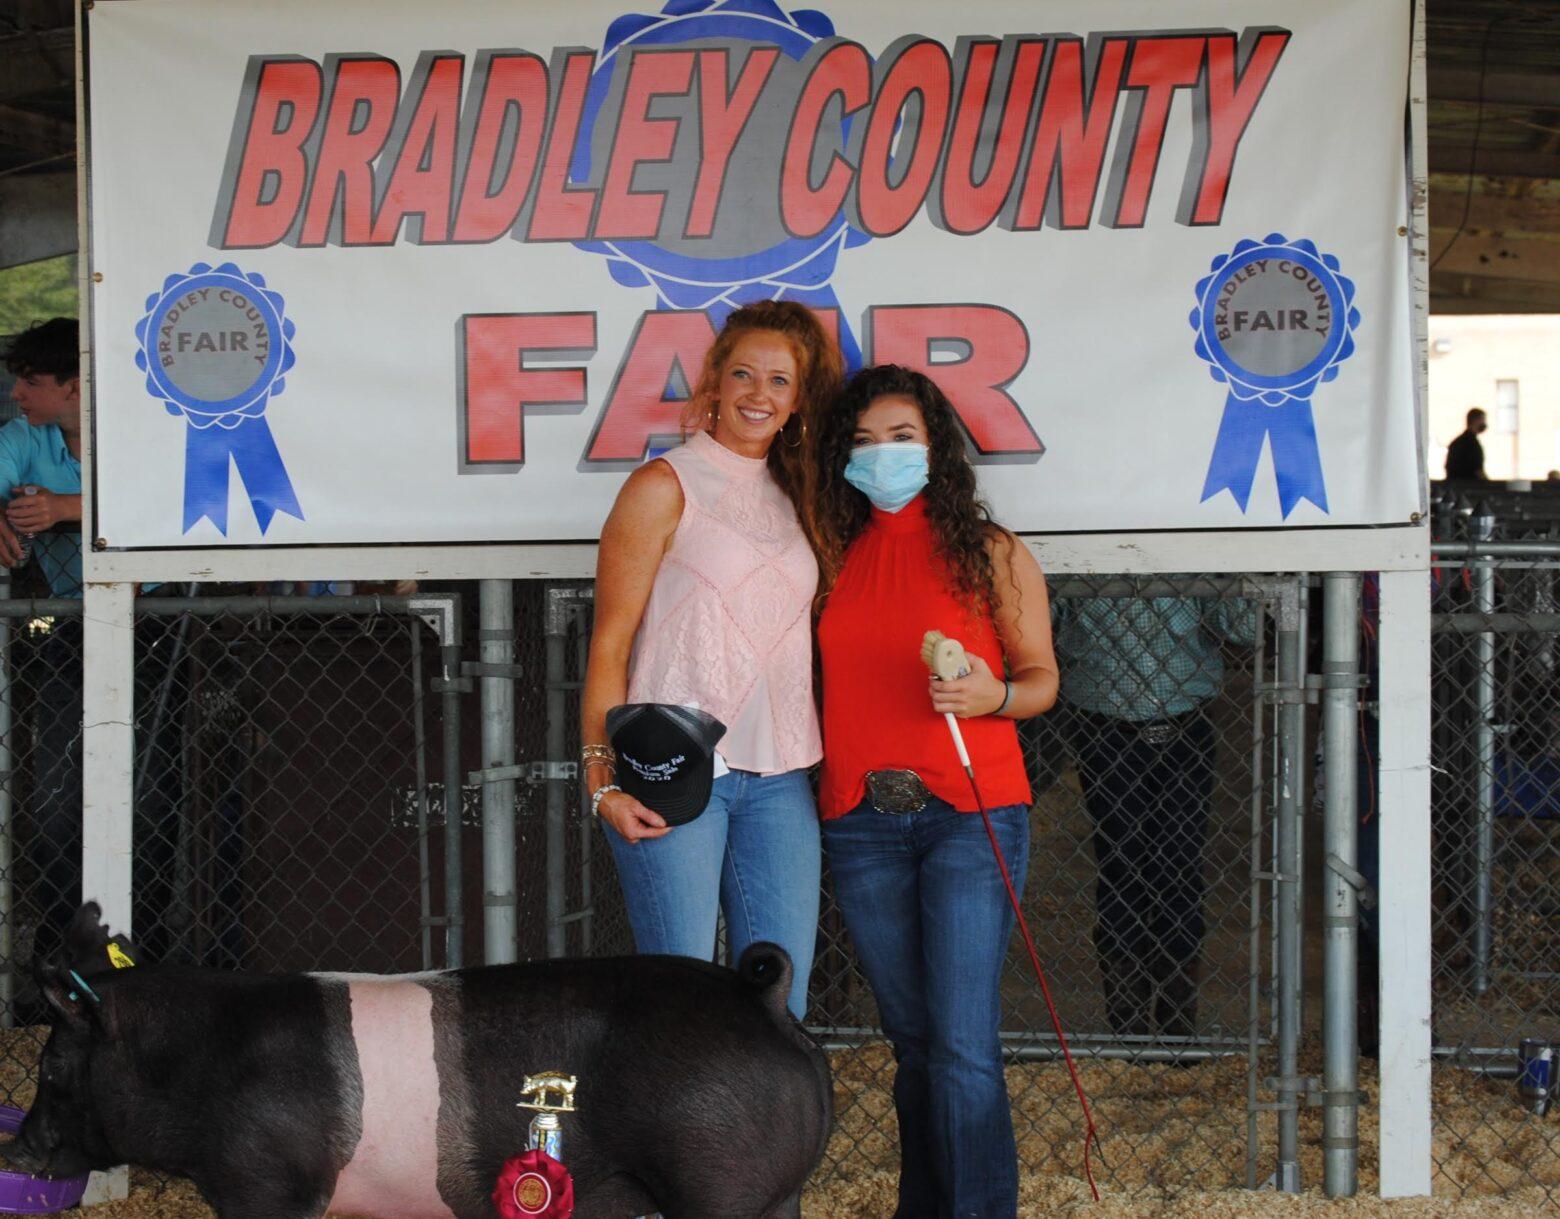 Bradley County Fair Livestock Exhibits health regulations announced